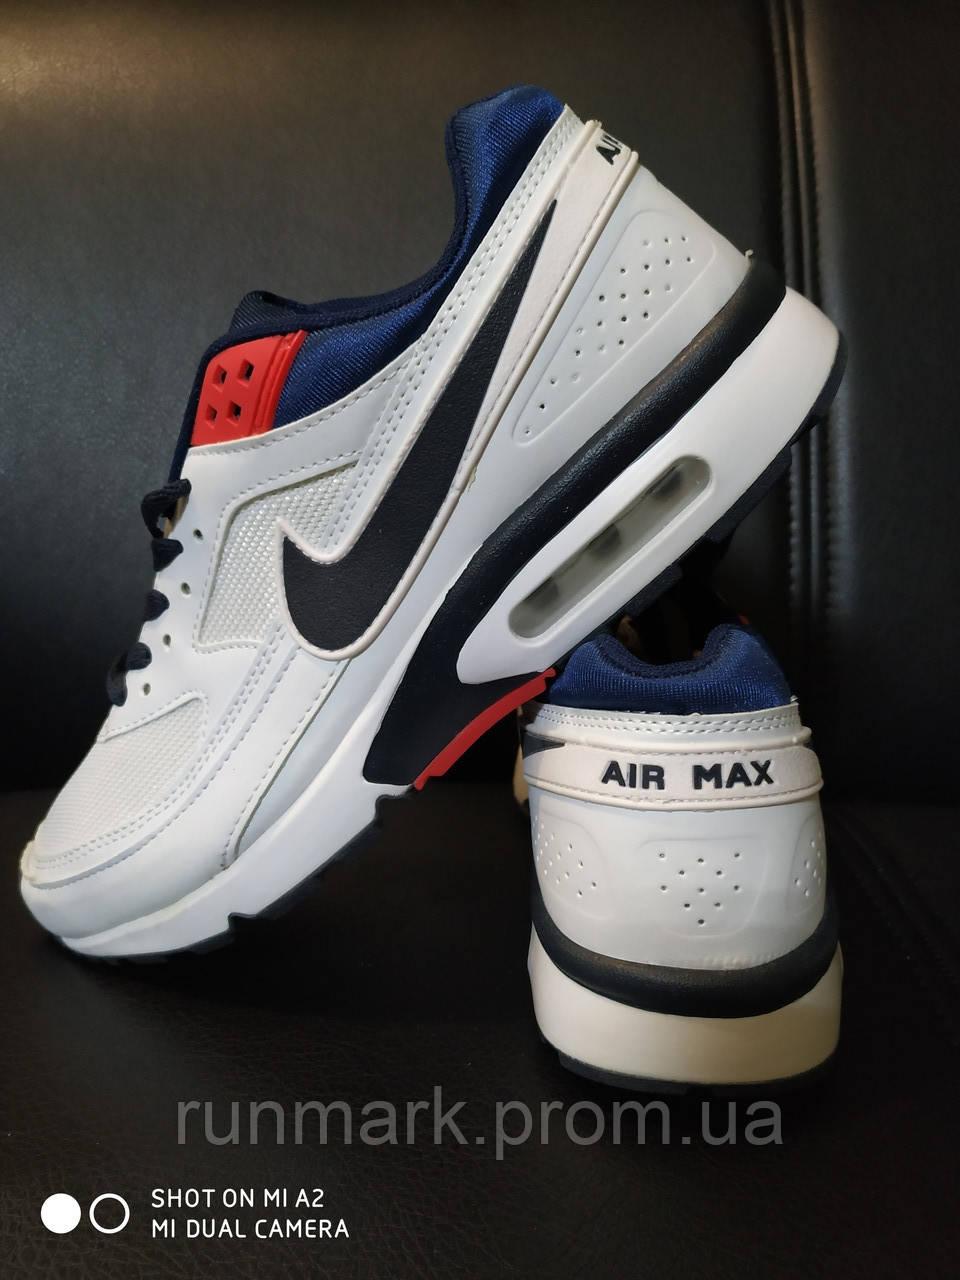 air max 43